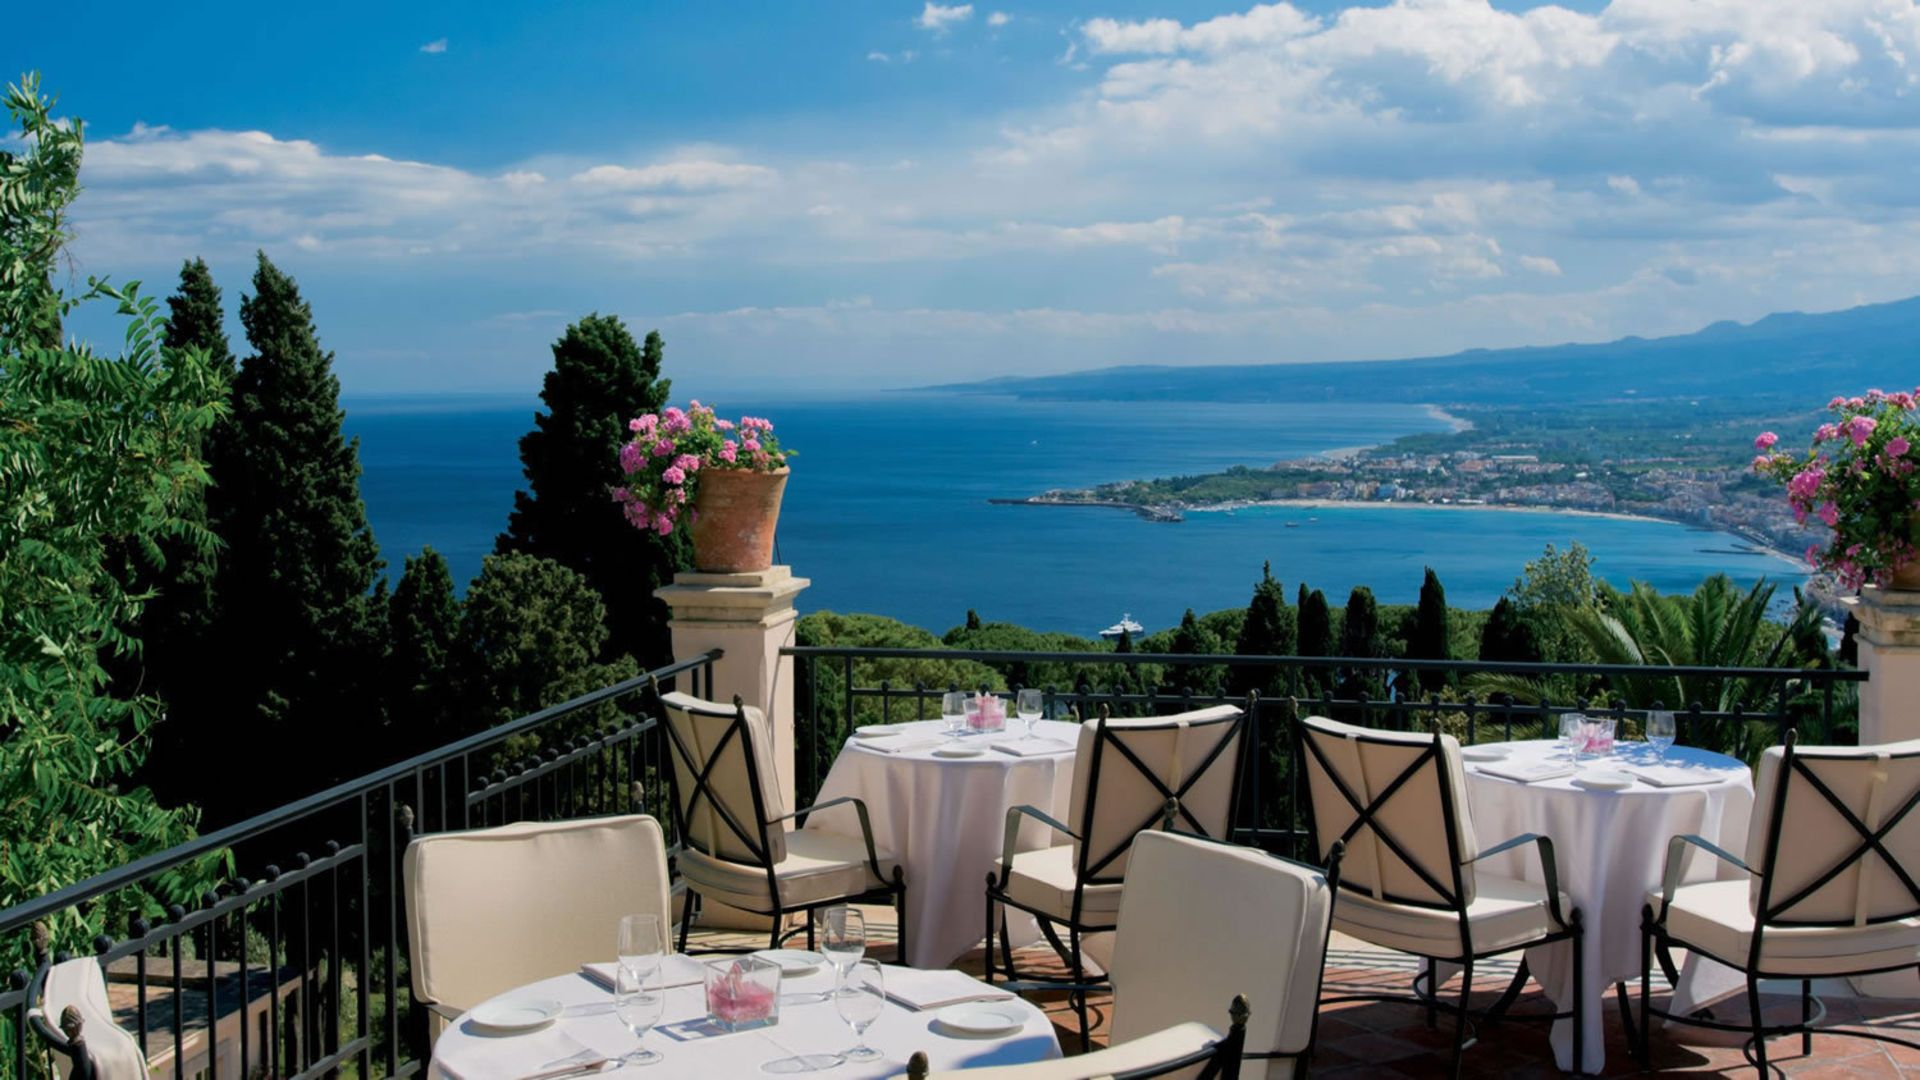 http://www.citalia.com/holidays/italy/sicily-and-the-aeolian-islands/taormina/hotels/belmond-grand-hotel-timeo